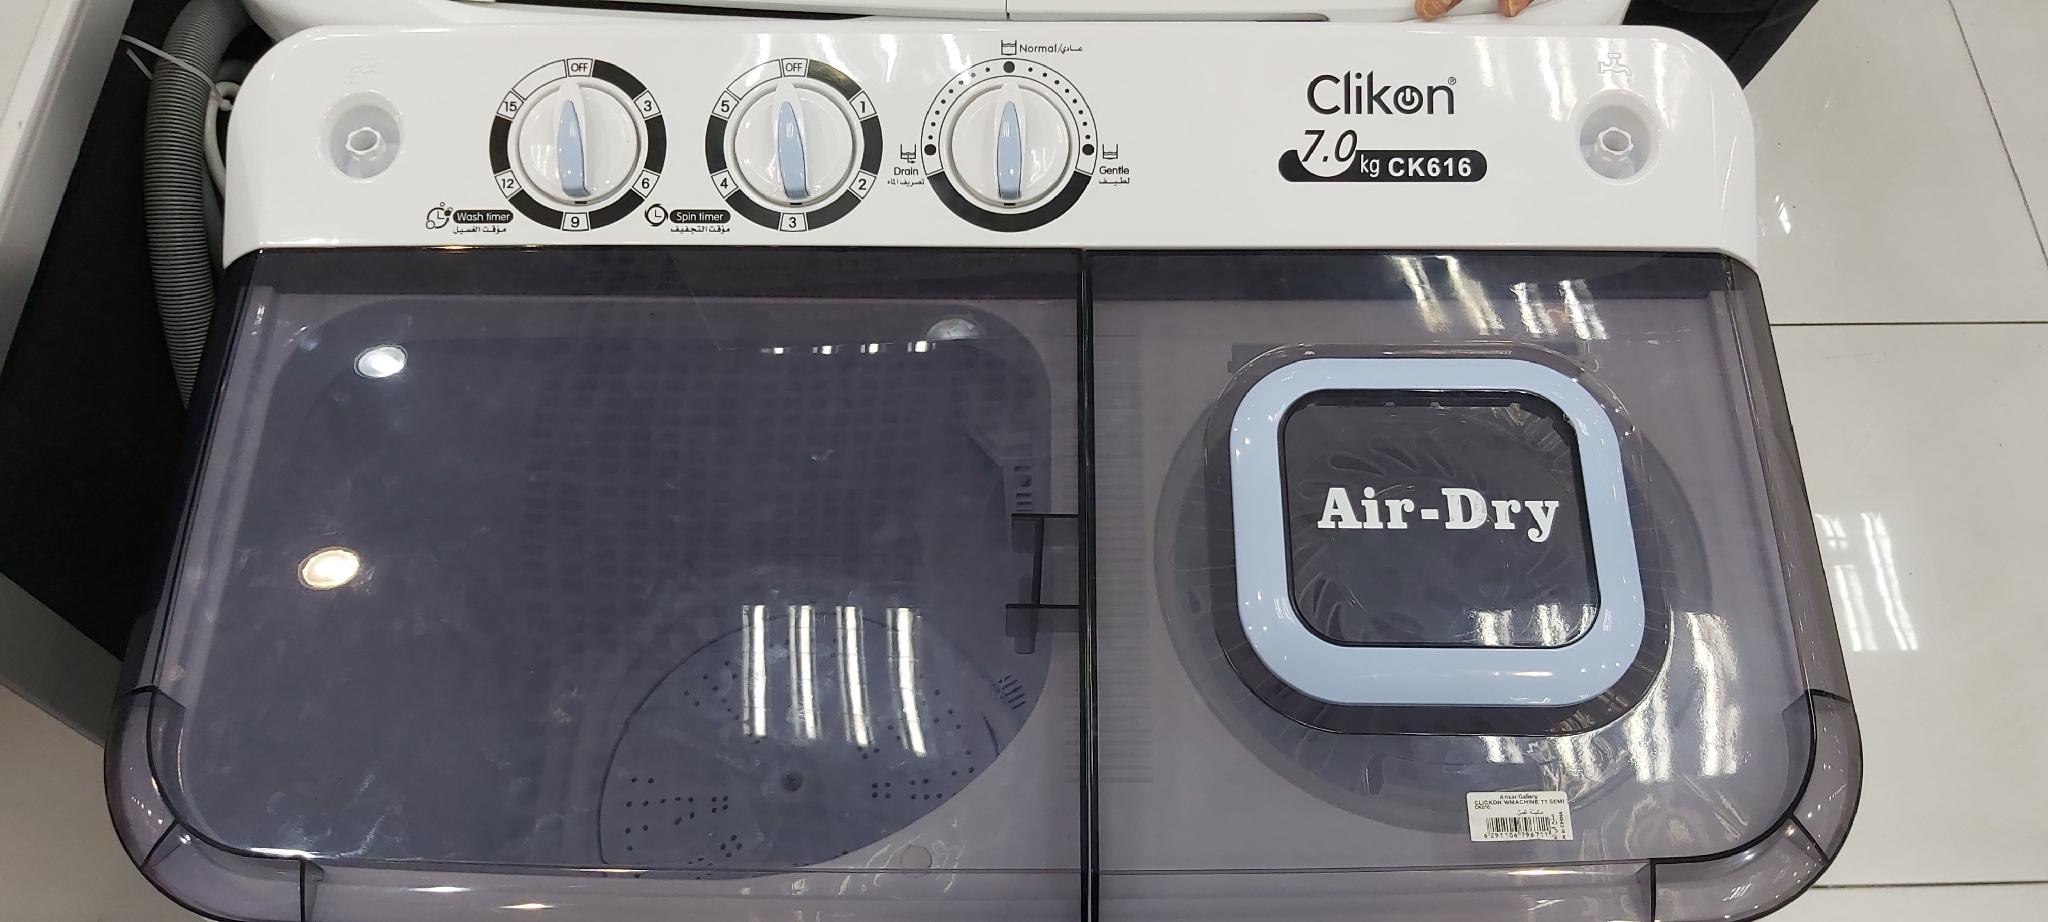 Clikon Semi Automatic Washing Machine